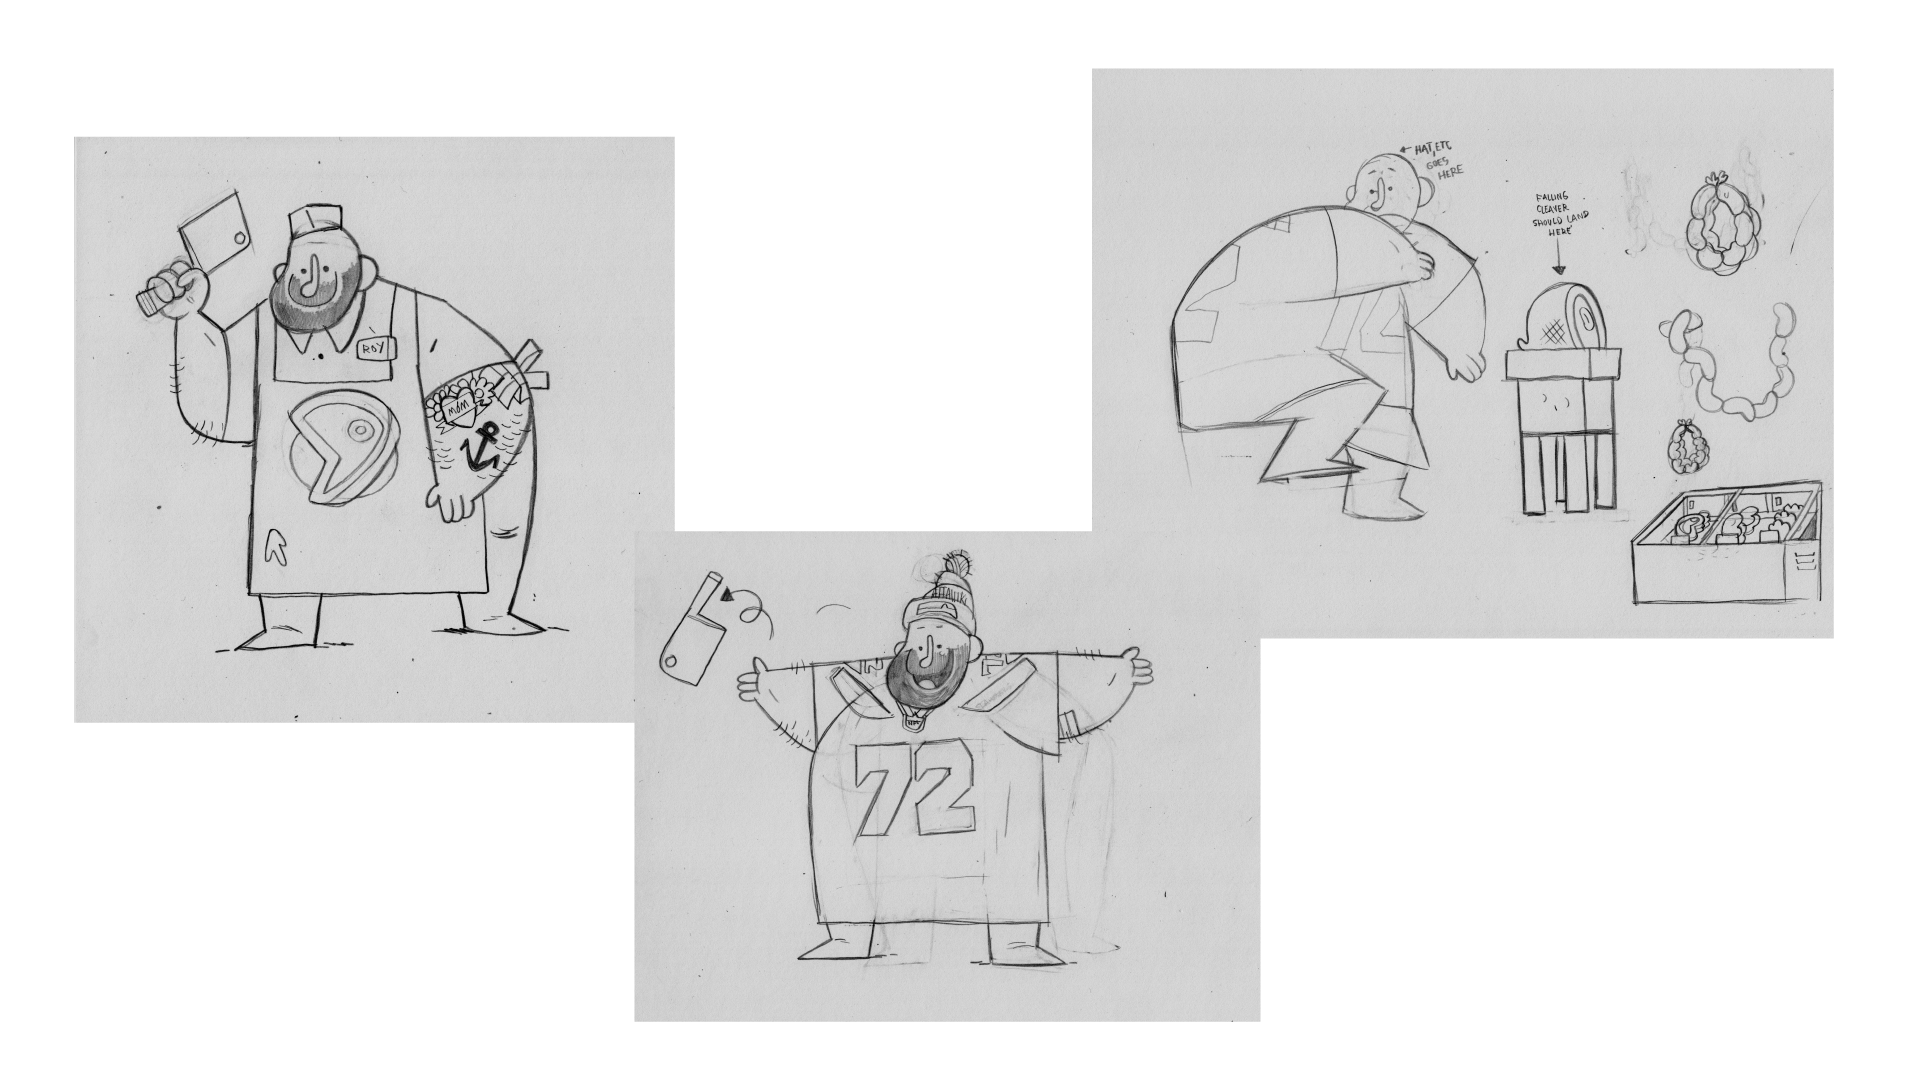 sketches_jon_01.png